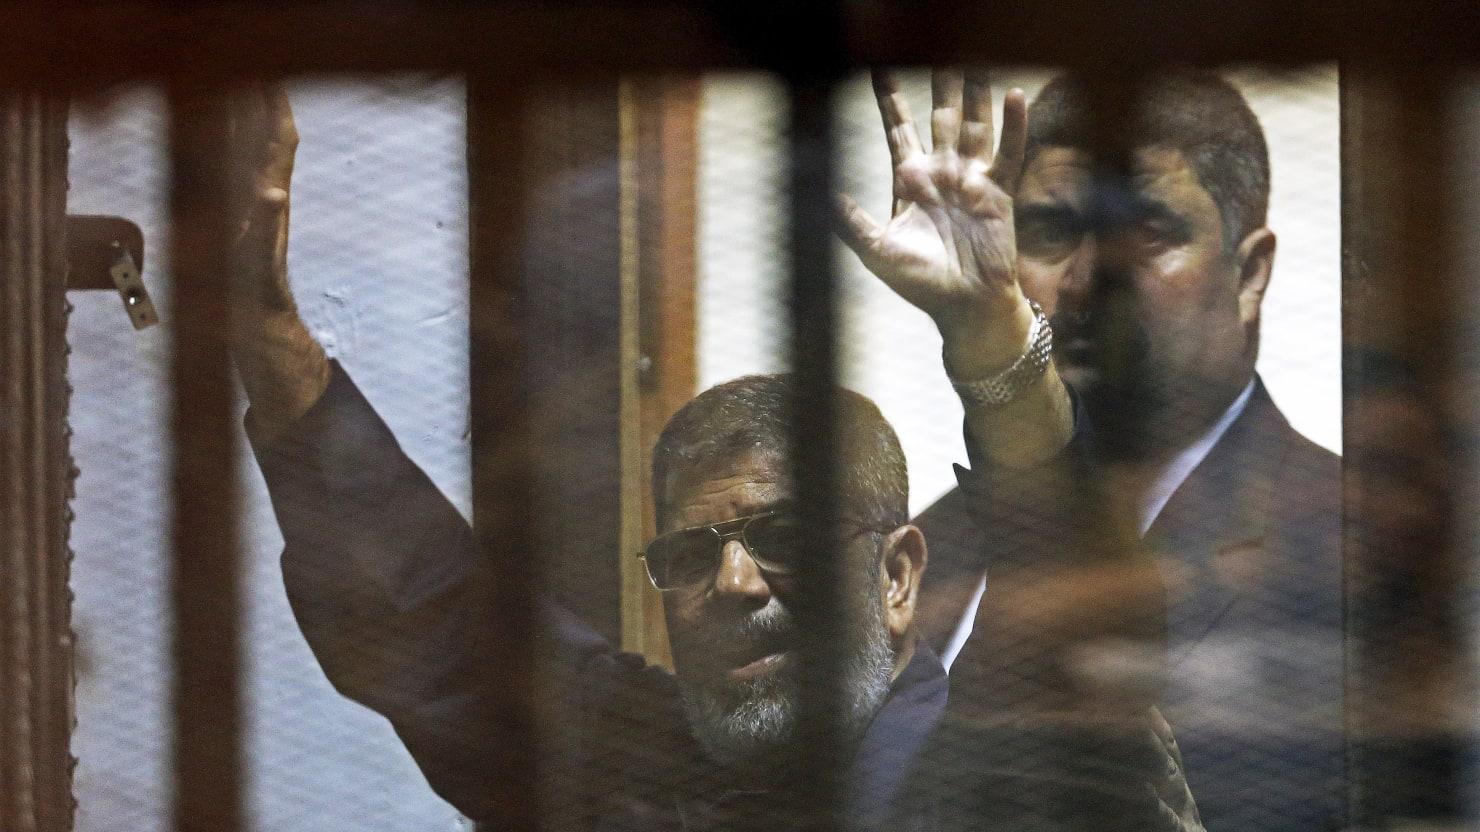 Egypt's Former President Mohamed Morsi Dies After Appearing in Court